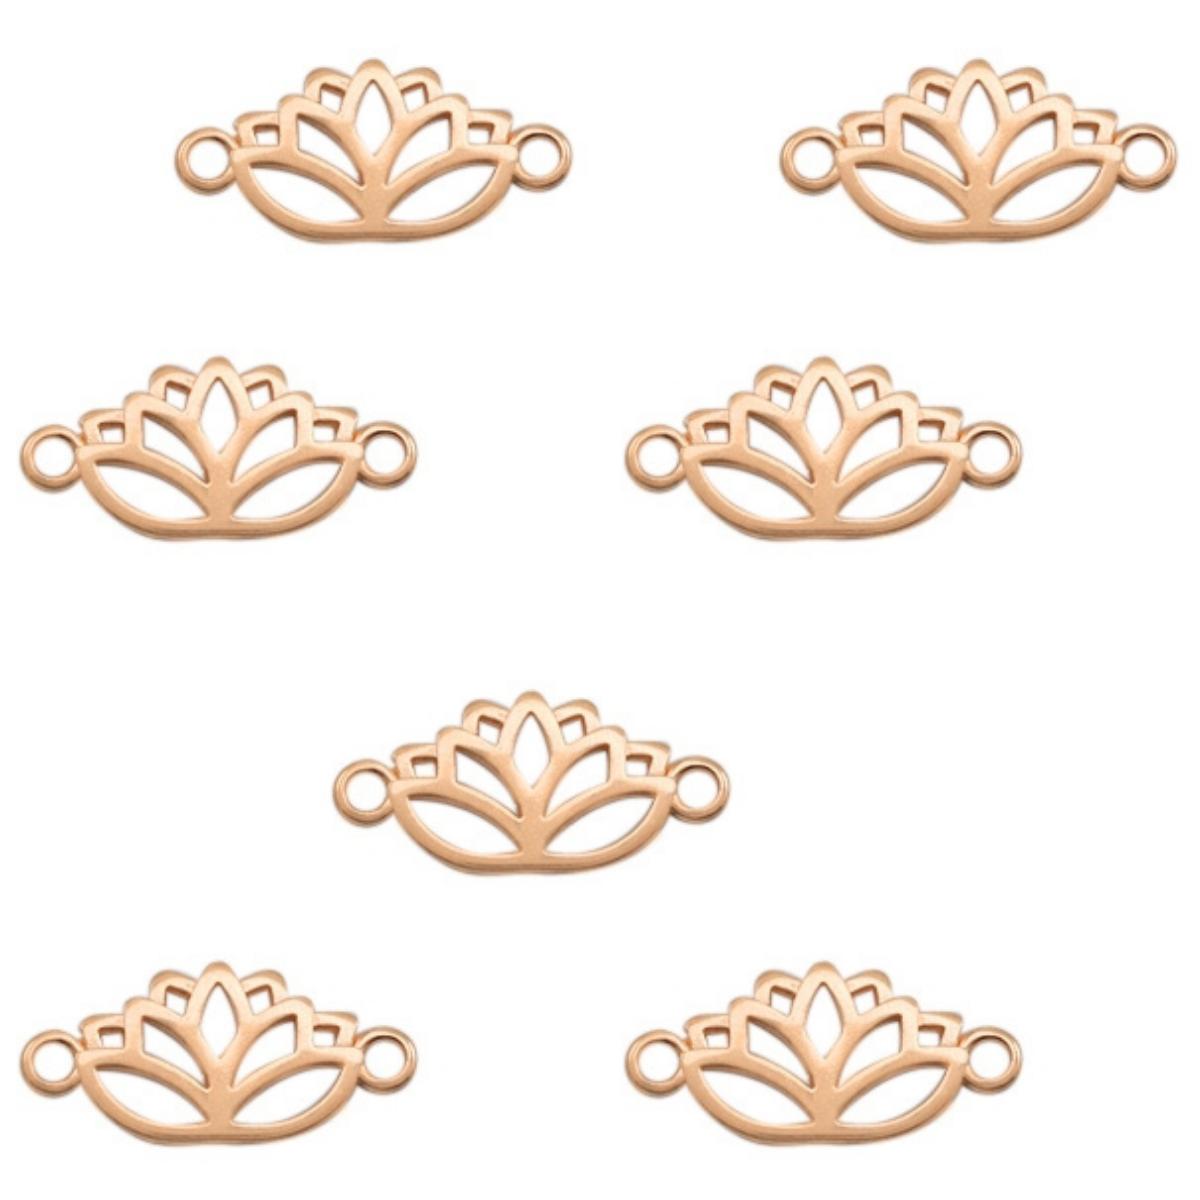 Schmuckverbinder Lotusblume 27x13mm, Farbe/Anzahl wählbar